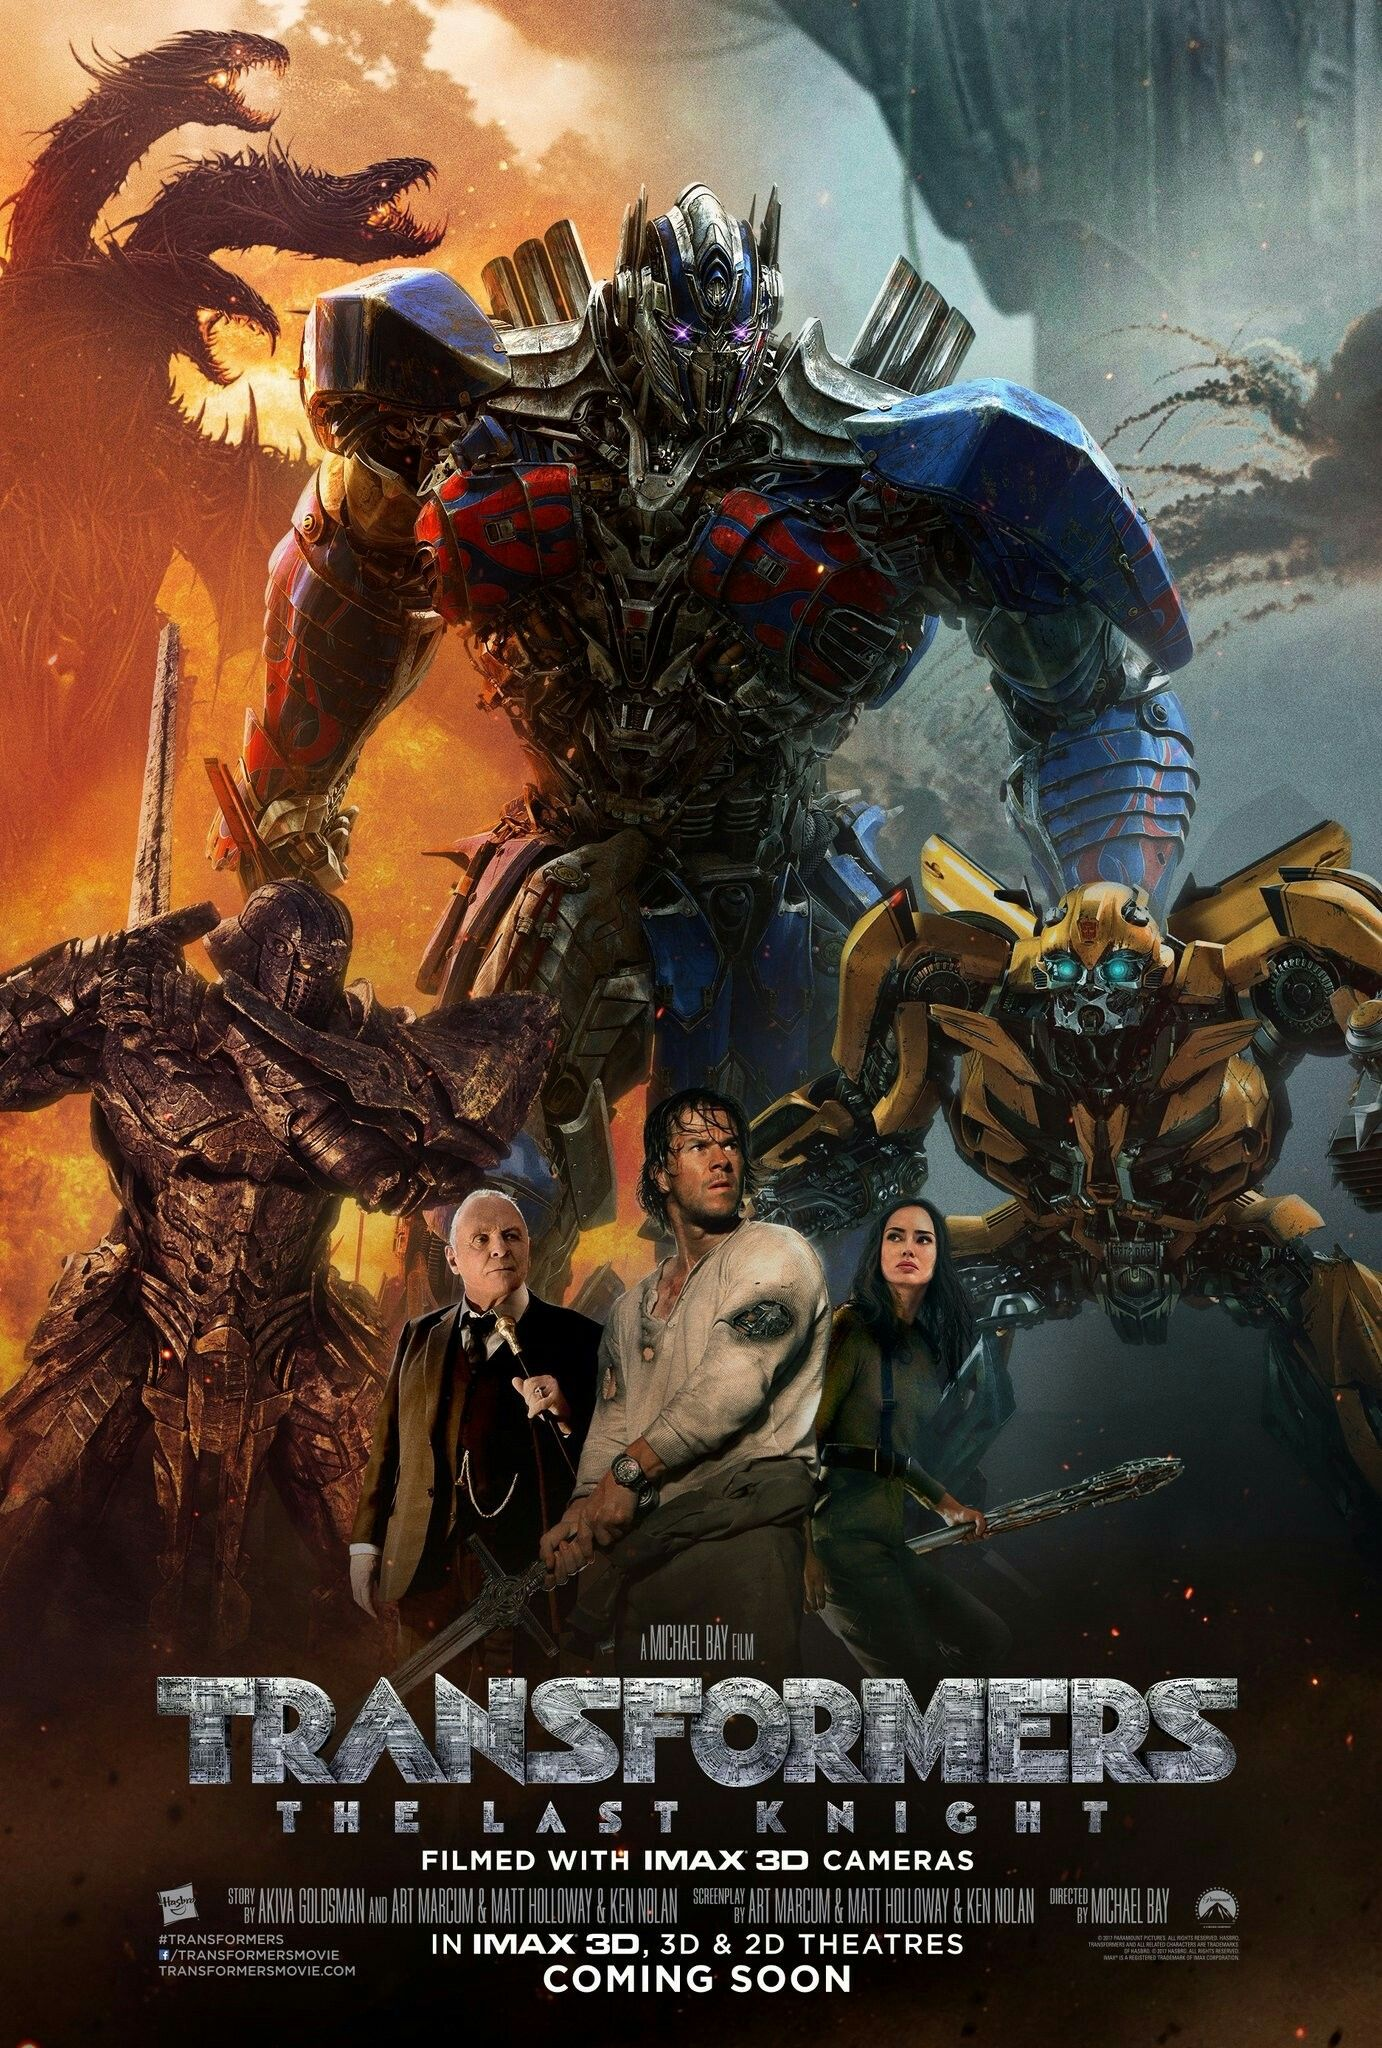 Transformers Last Knight Streaming : transformers, knight, streaming, Primal, Sound, Transformers, Movieverse, Knights,, Movies, Online,, Streaming, Online